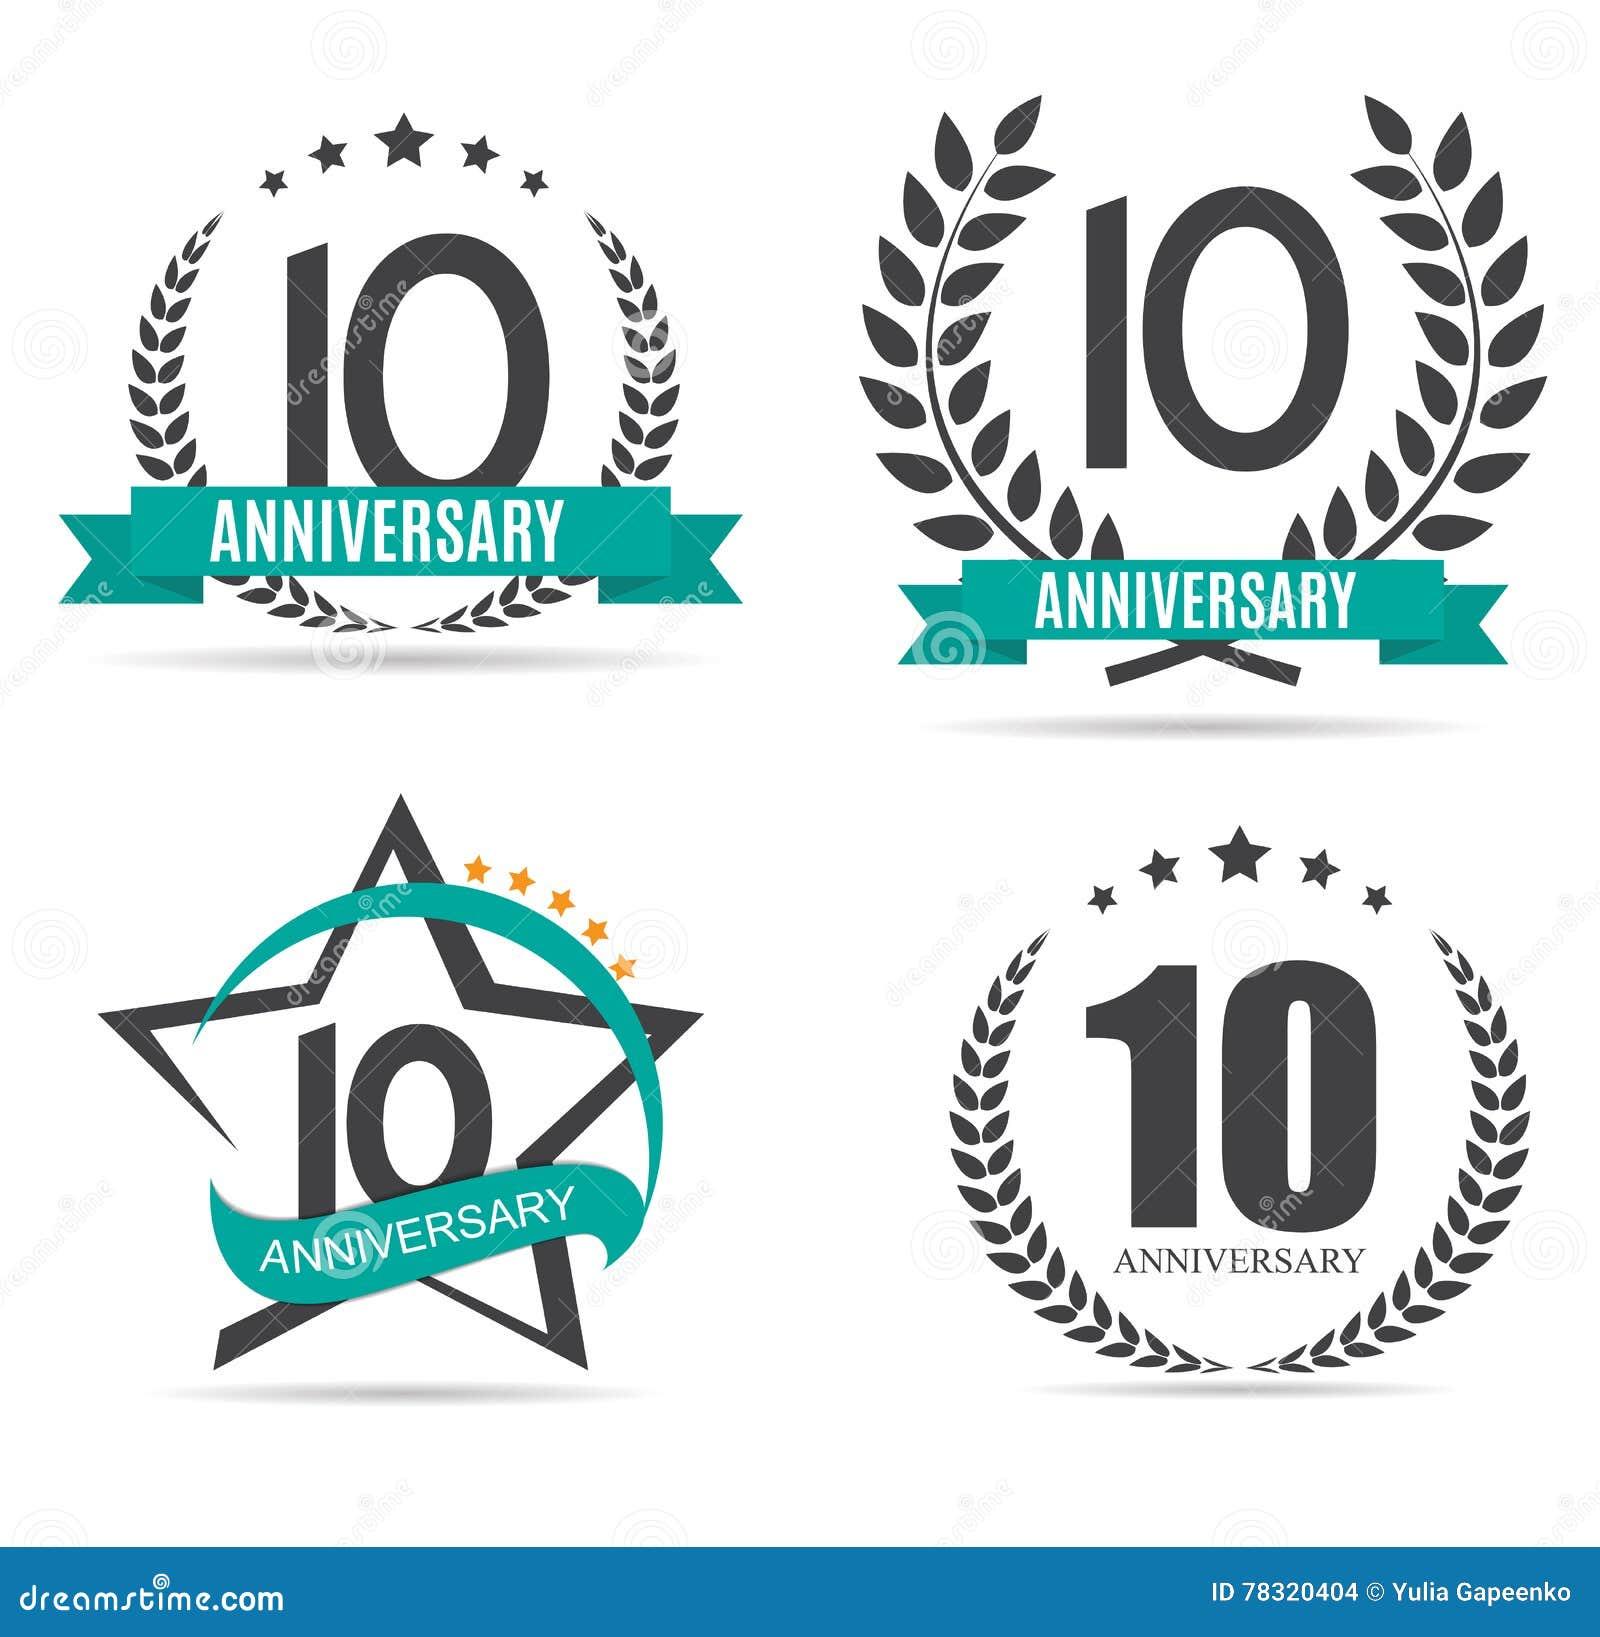 anniversary logo vector - photo #11